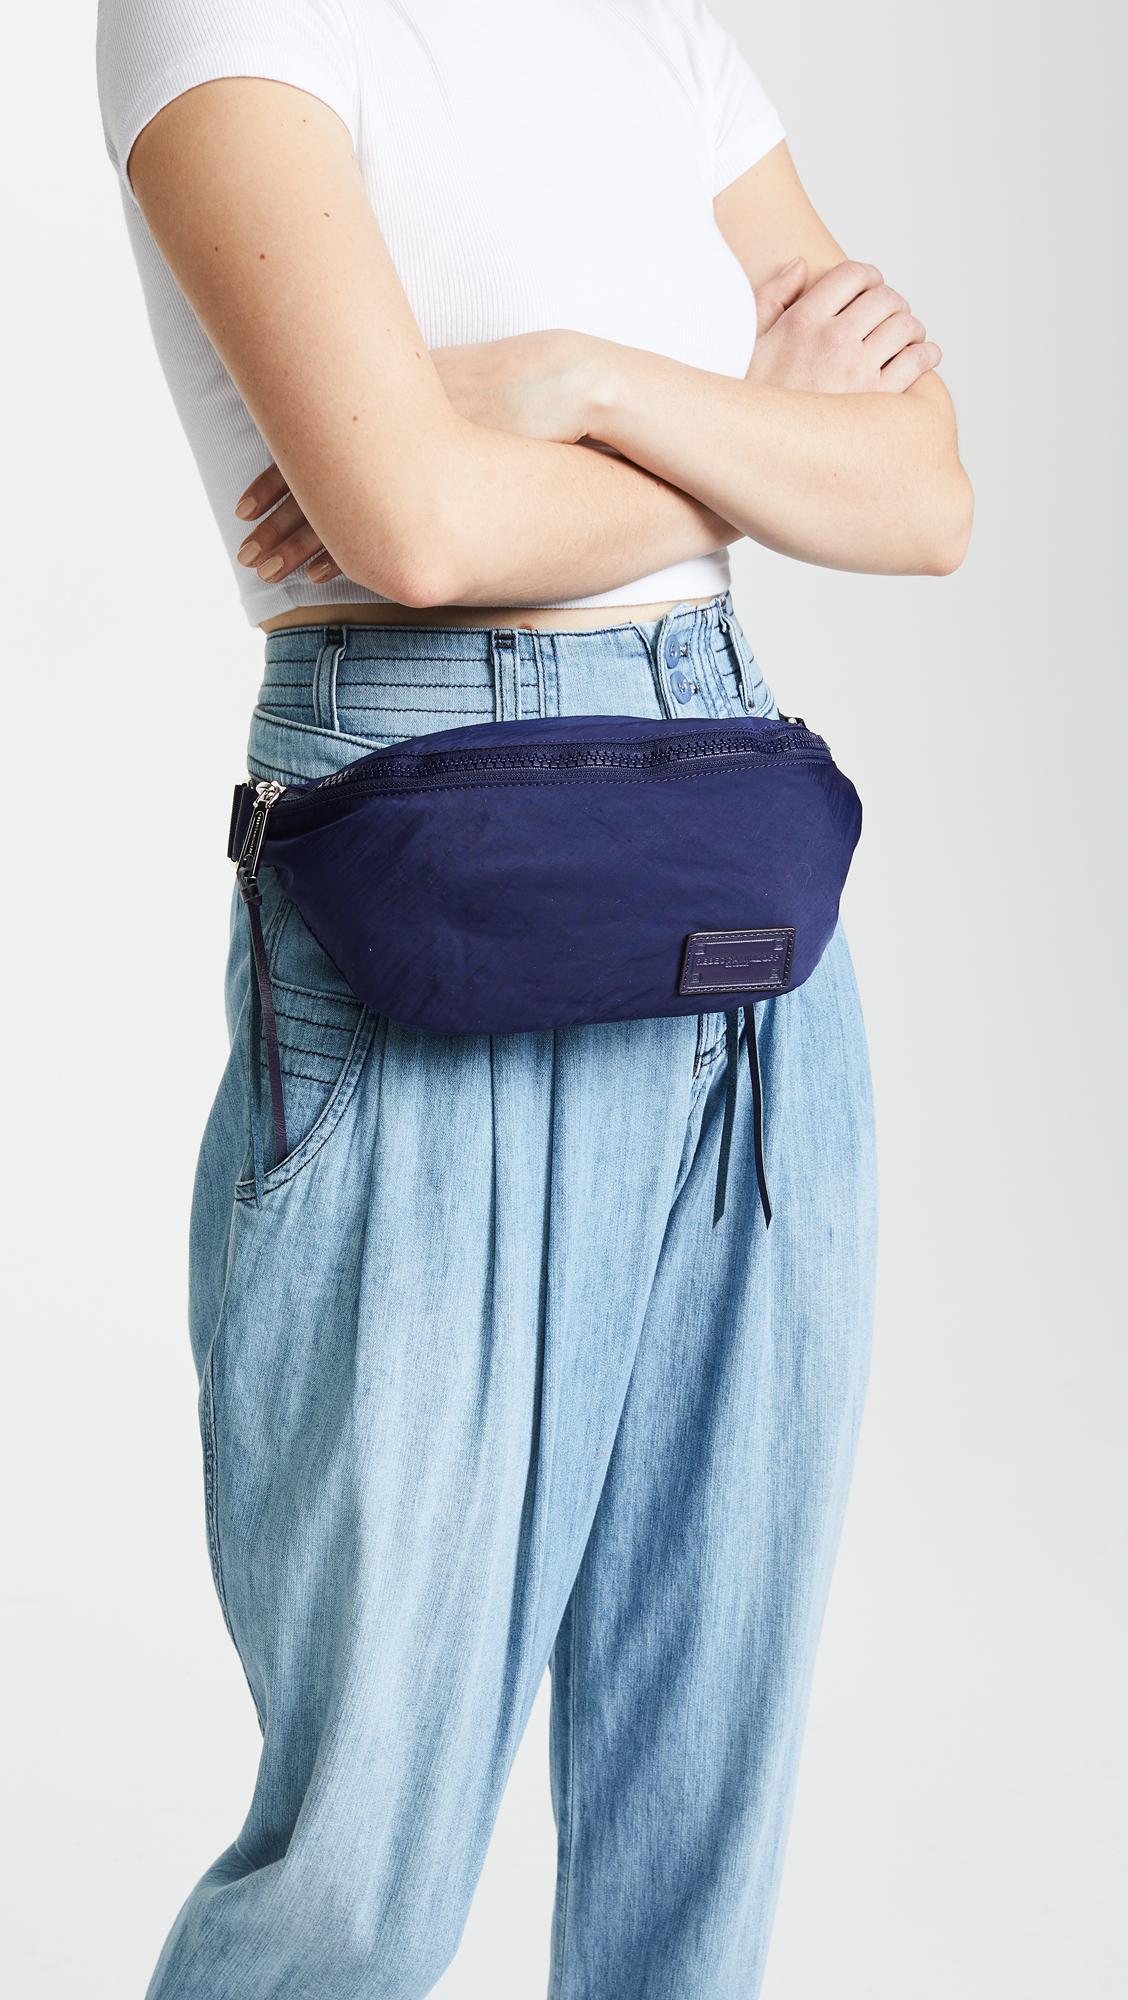 Rebecca Minkoff Nylon Belt Bag blue的圖片搜尋結果